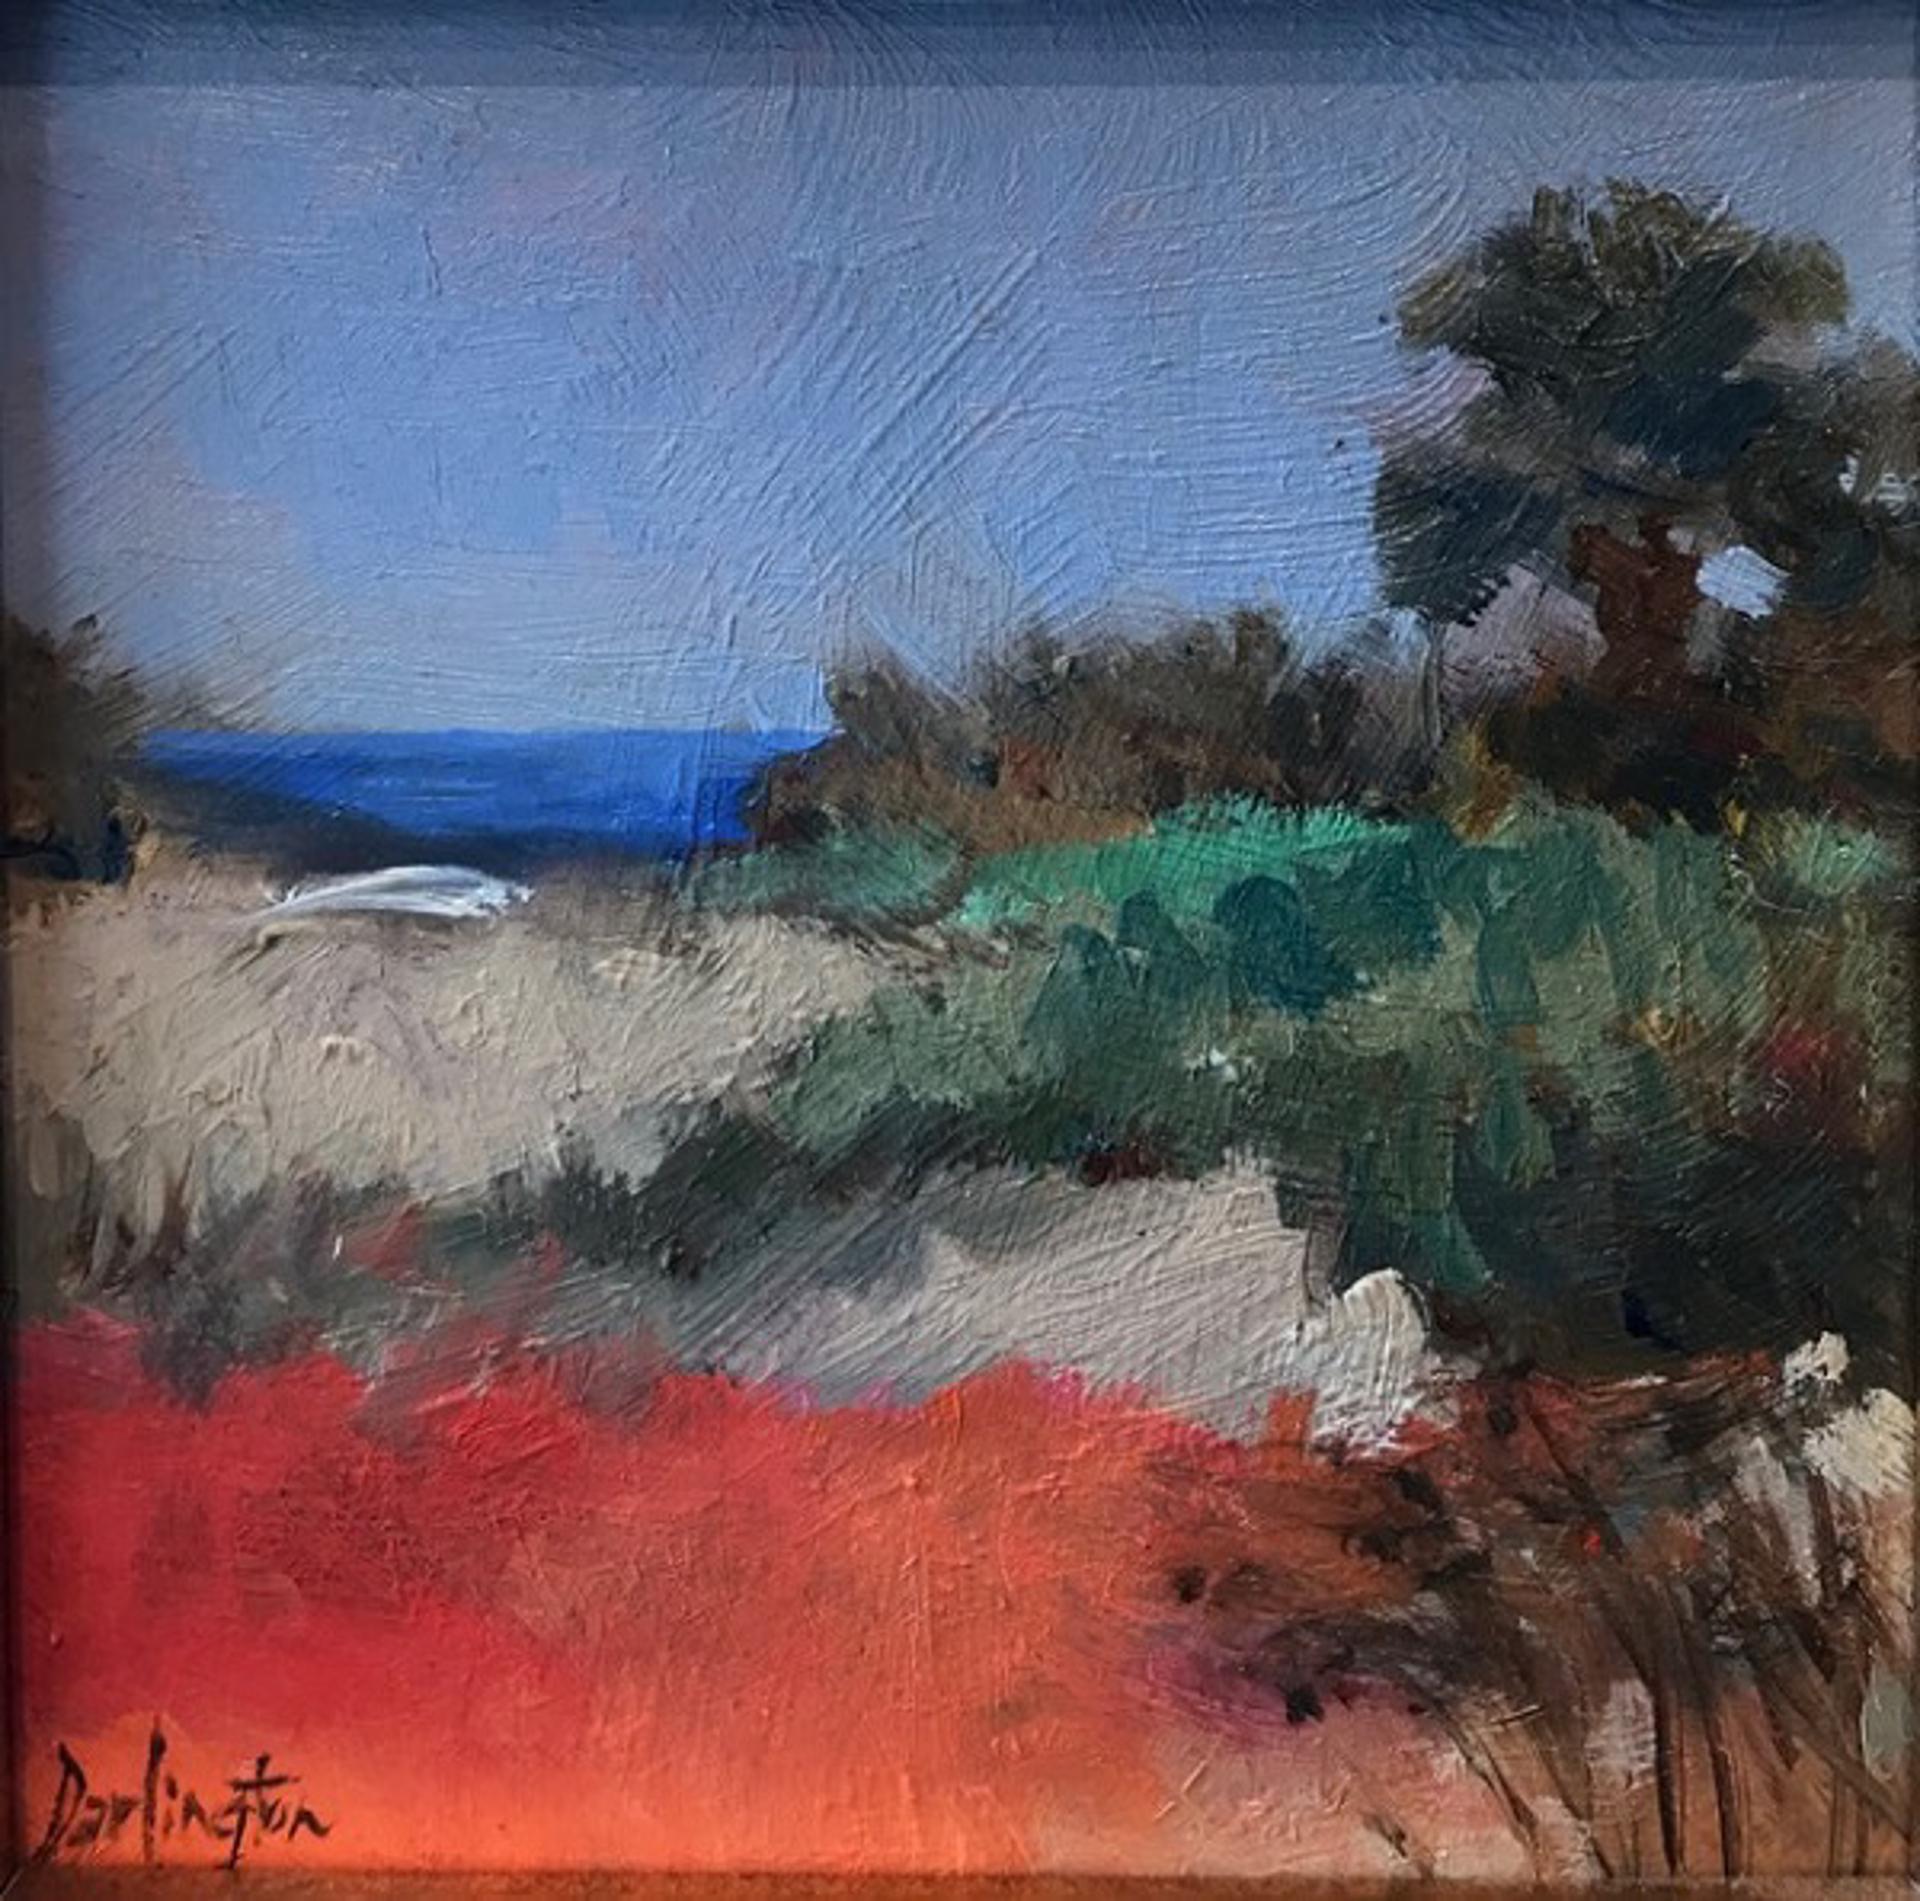 Beyond The Dunes by Jim Darlington